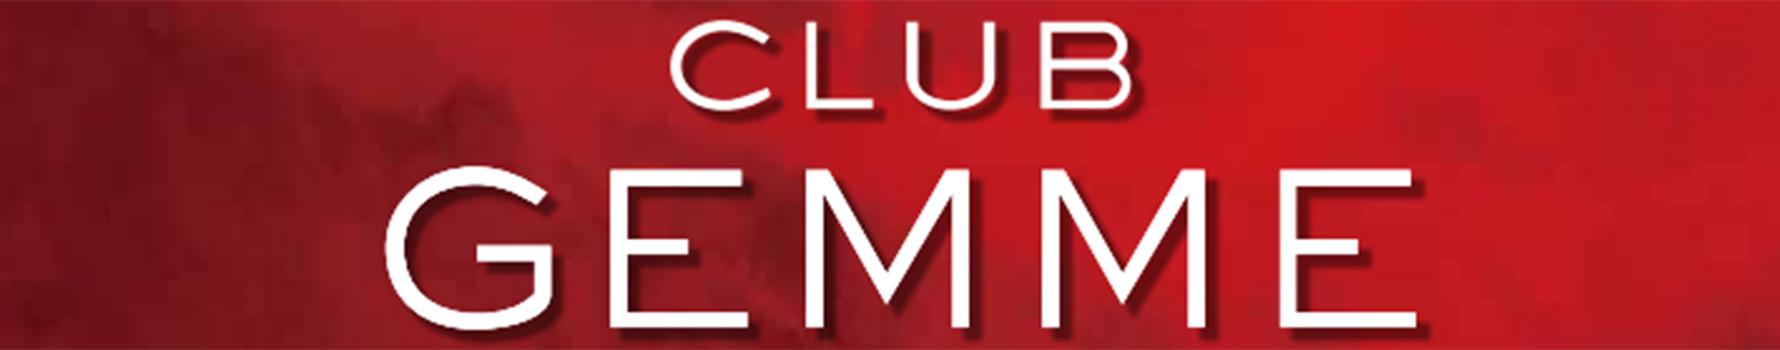 CLUB GEMME【クラブ ジェム】(立川)のロゴ